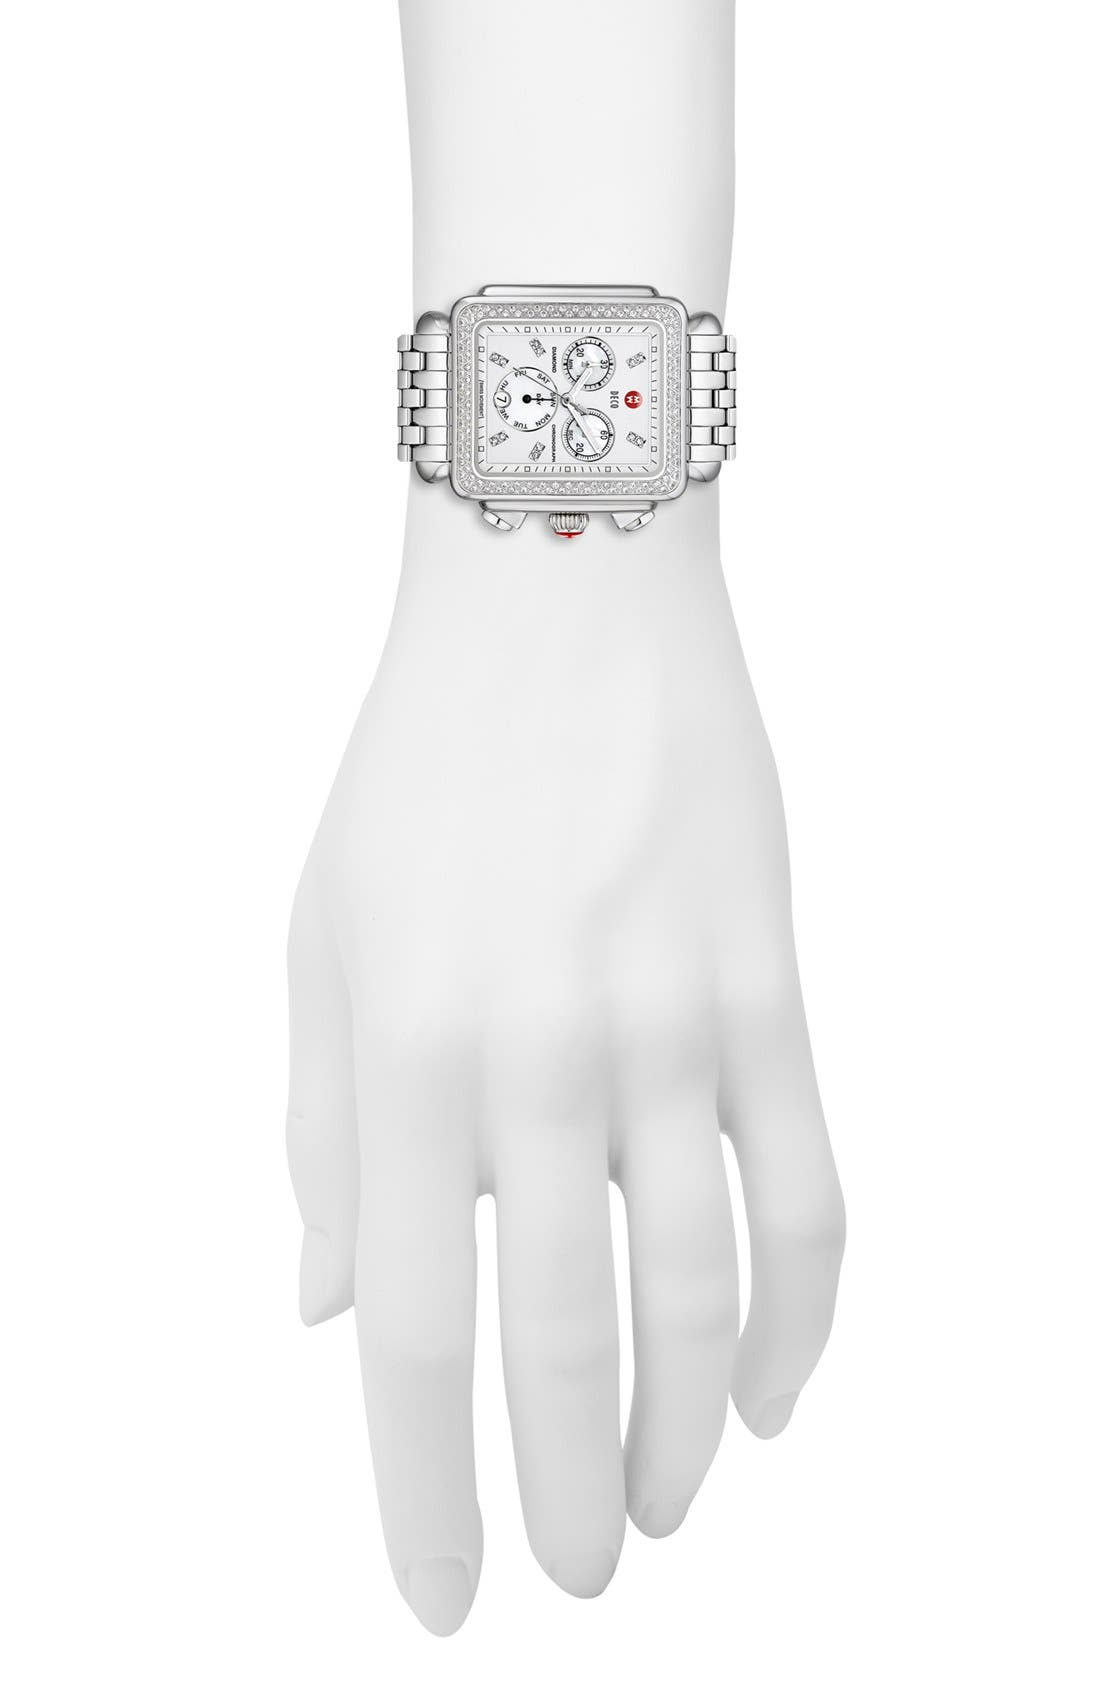 Alternate Image 2  - MICHELE 'Deco XL Diamond' Diamond Dial Watch Case, 37mm x 38mm